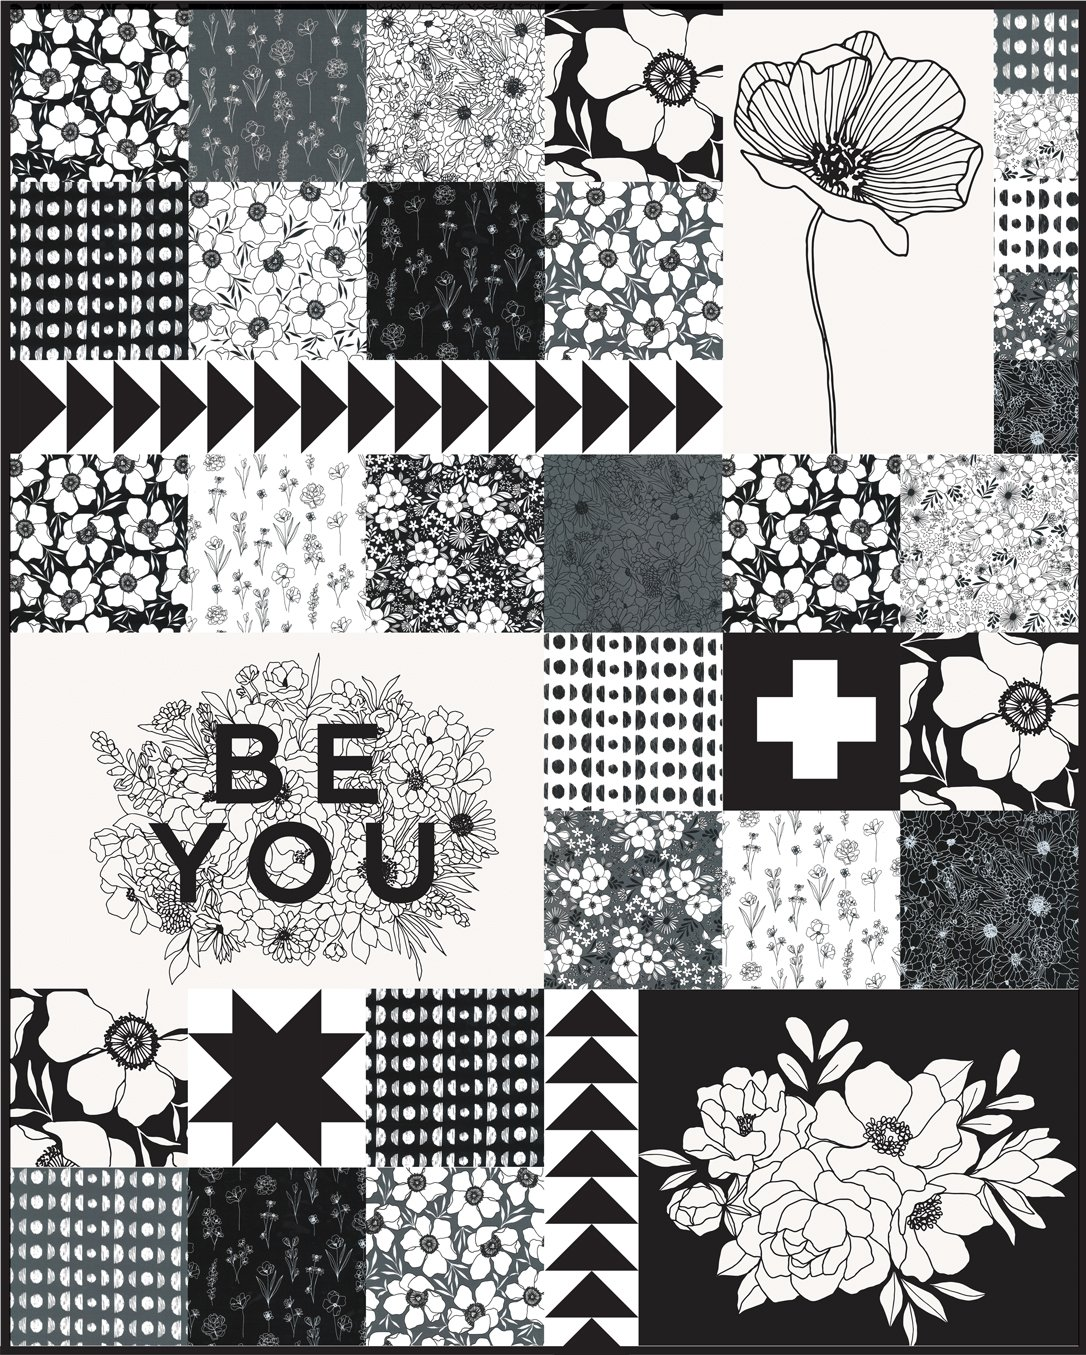 Illustrated Squares Quilt kit